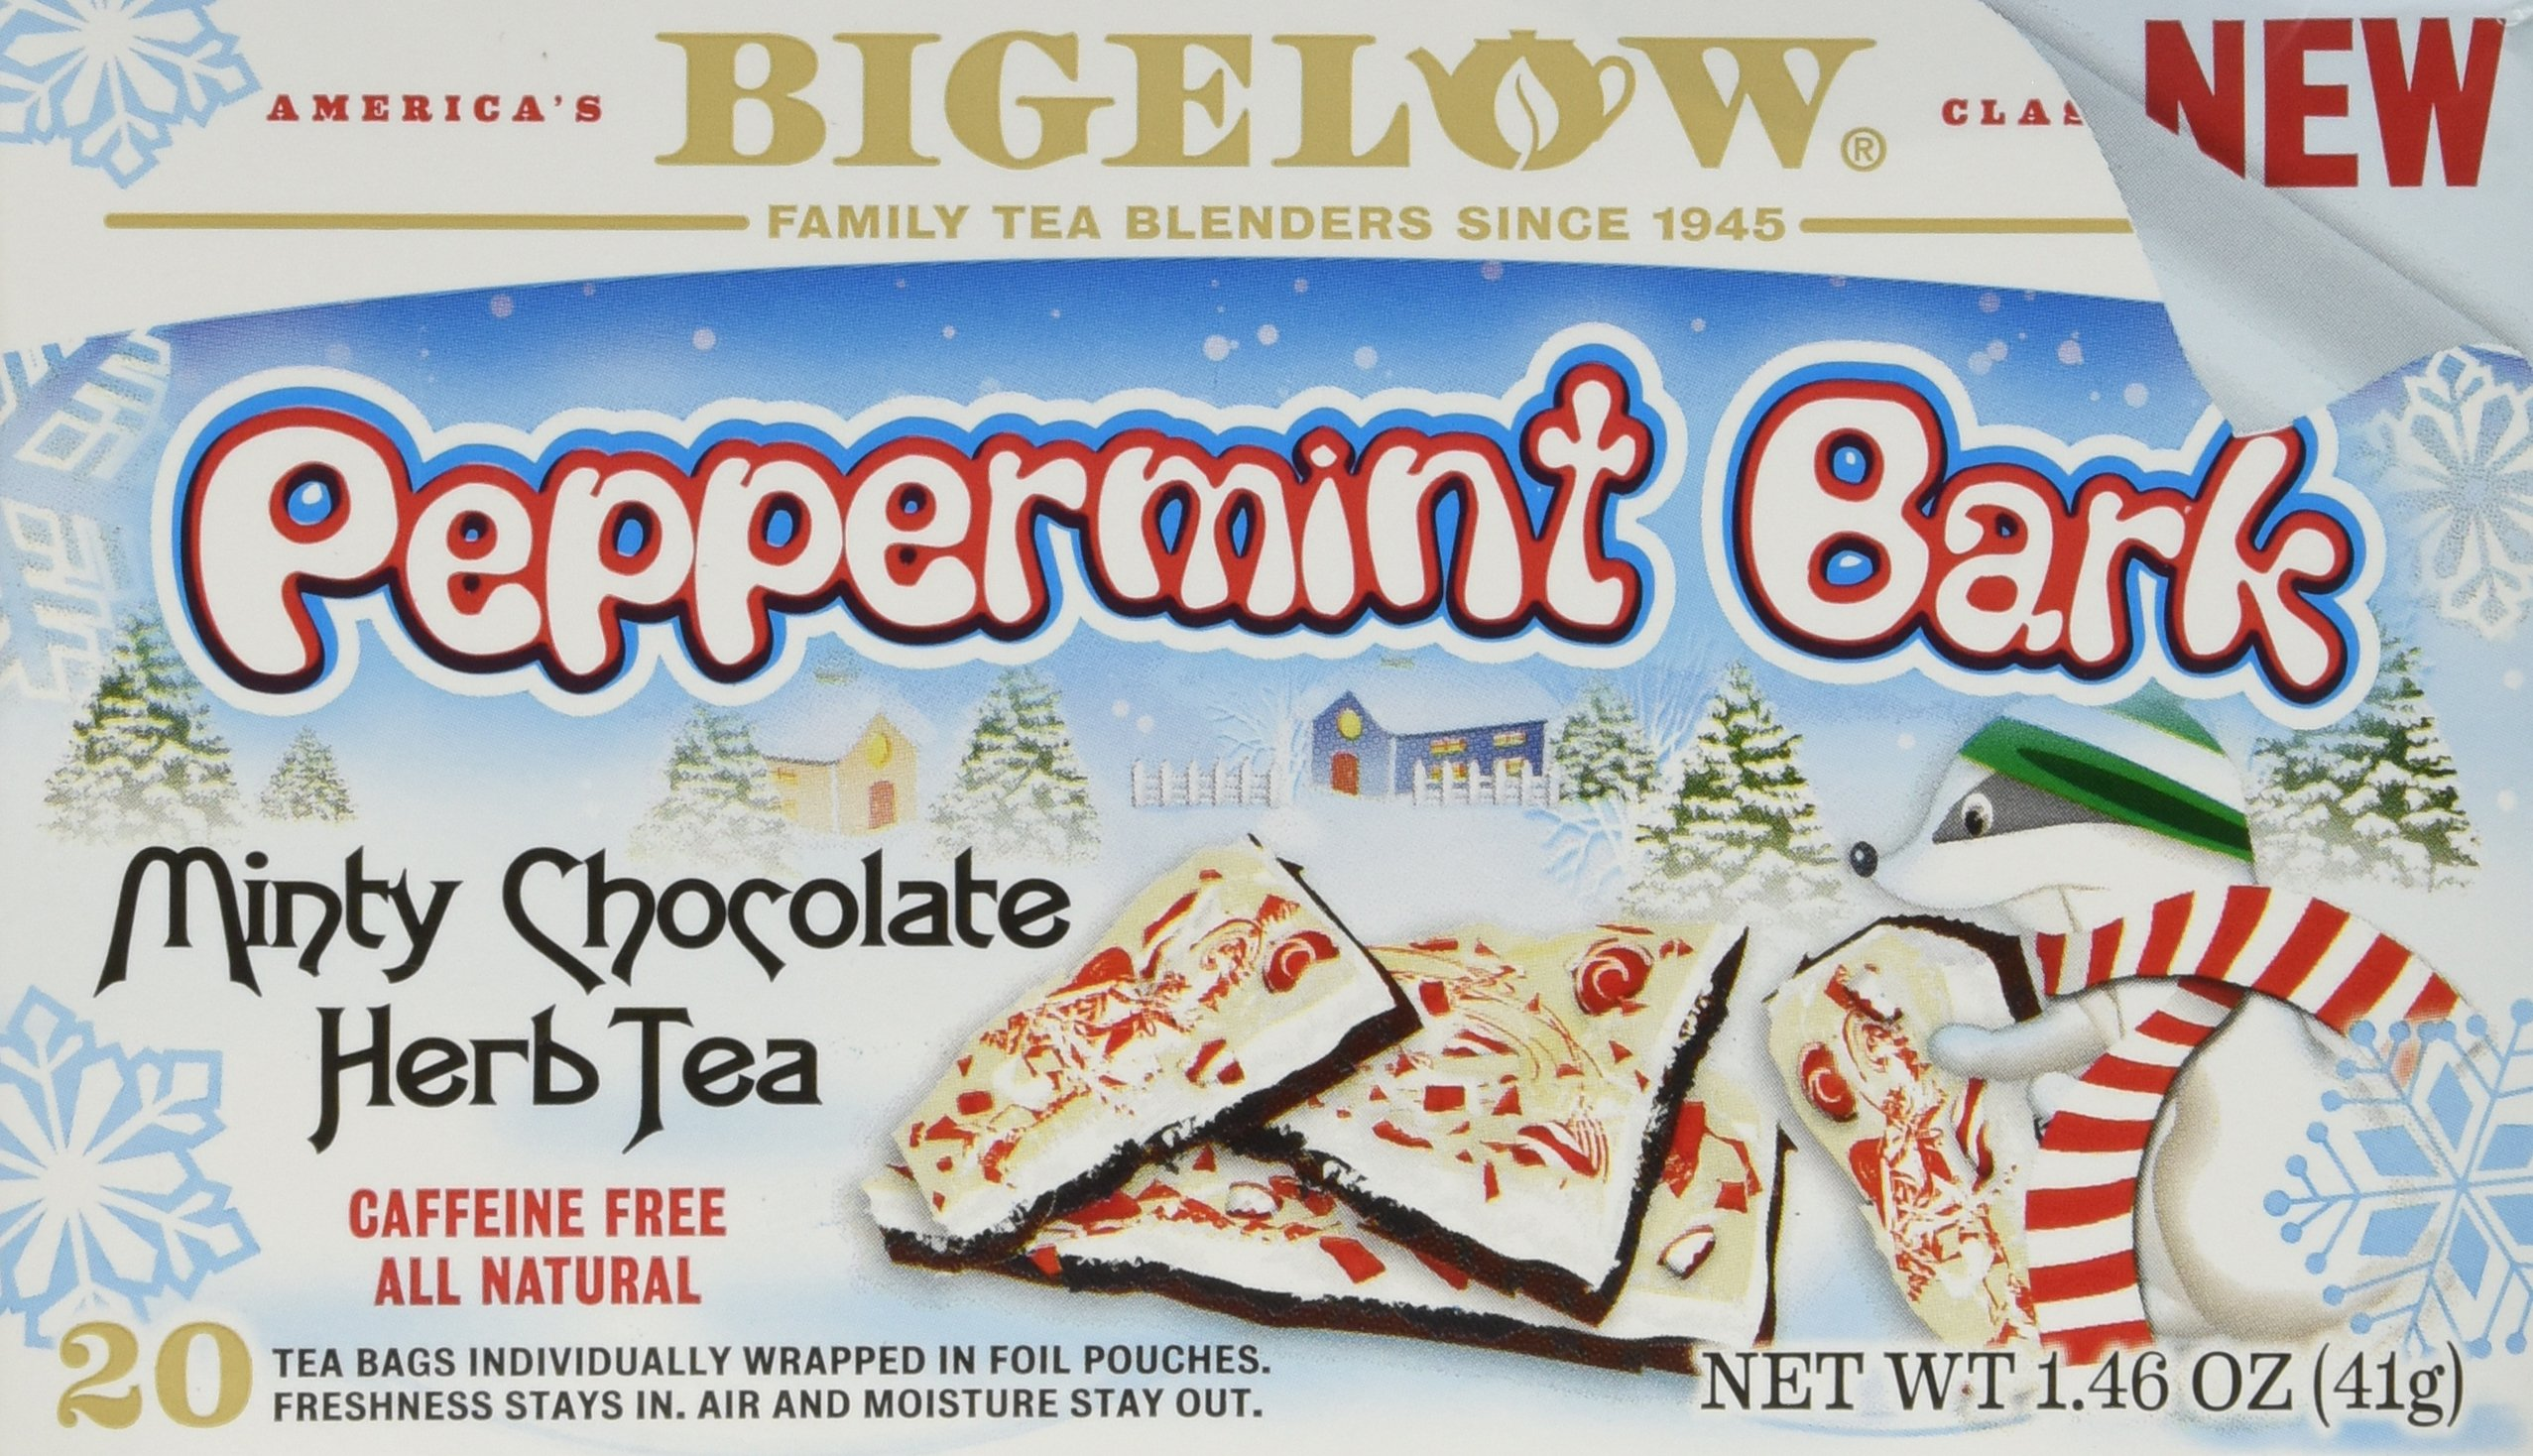 Bigelow Tea Peppermint Bark Minty Chocolate Herbal Tea, 20 Count